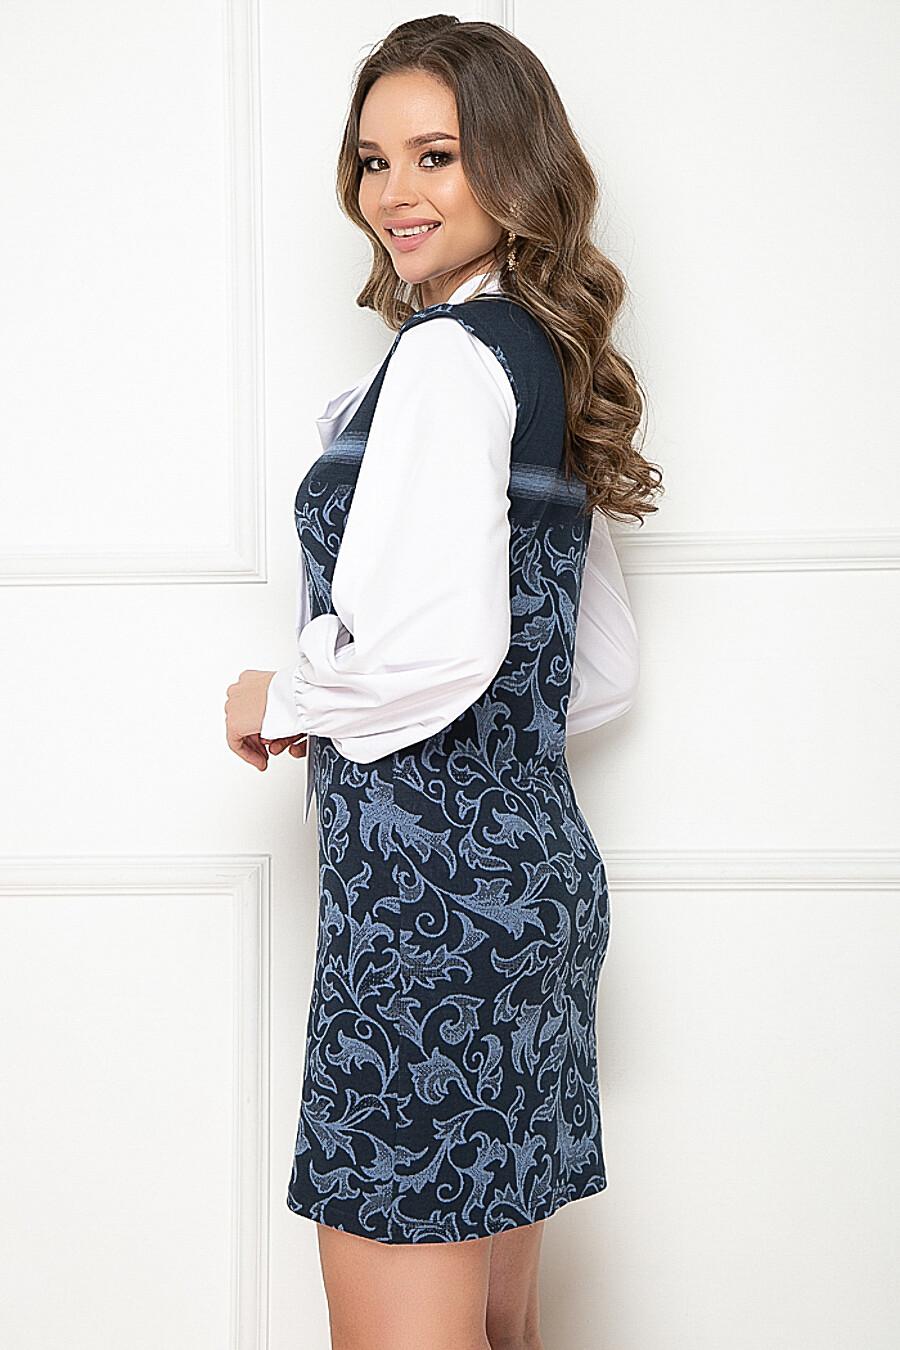 САРАФАН ТЭКИТО (БЛУ) BELLOVERA (289722), купить в Moyo.moda